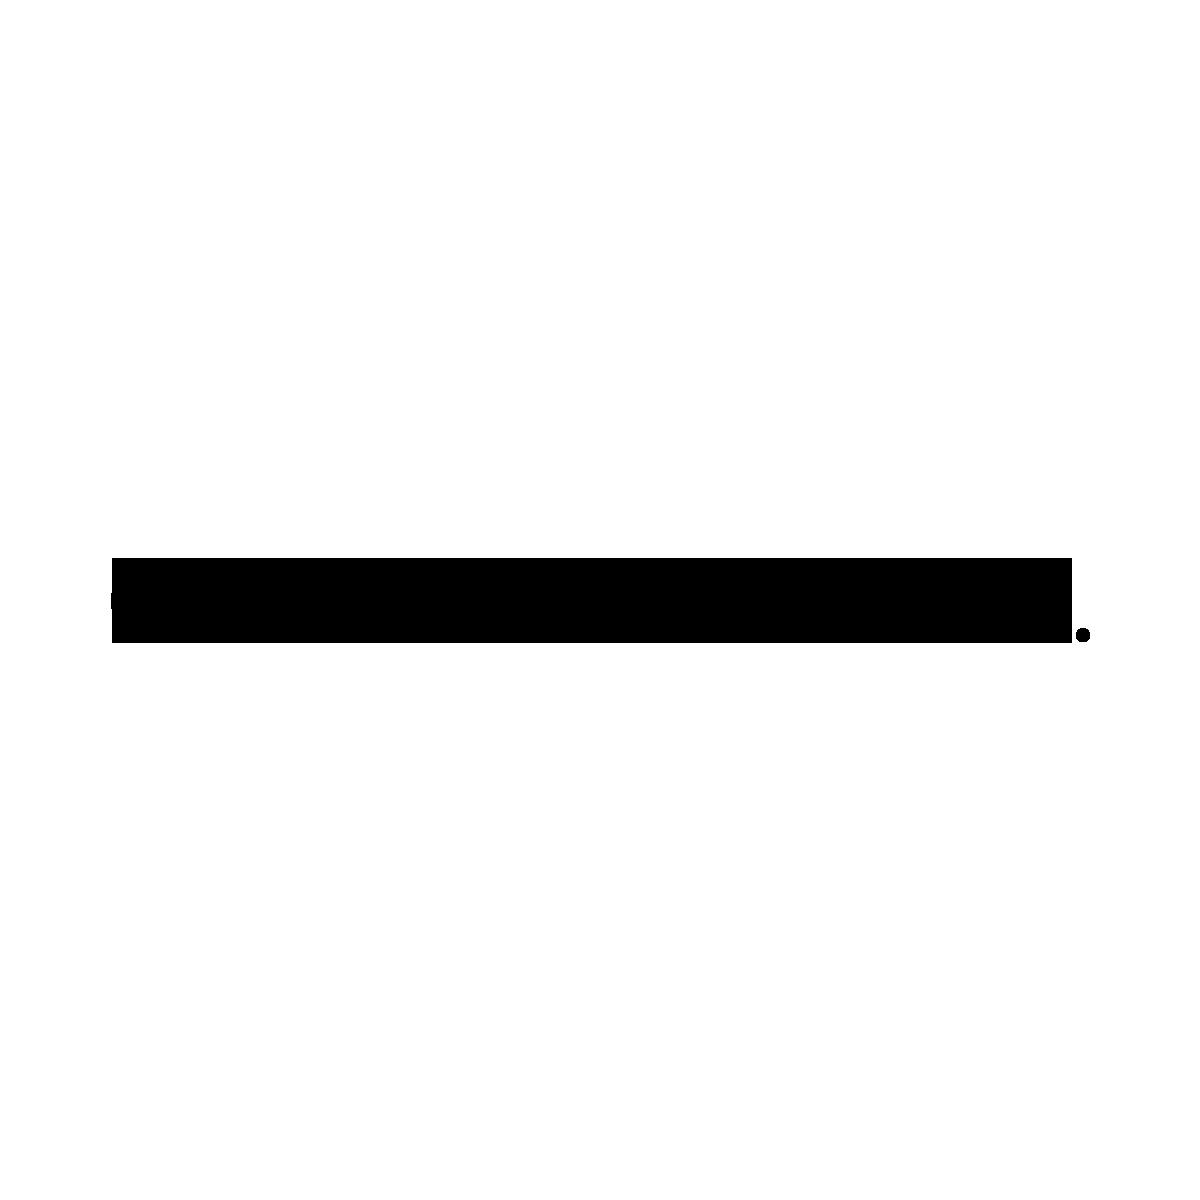 Brown leather sandal fred de la bretoniere 170010009 detail above